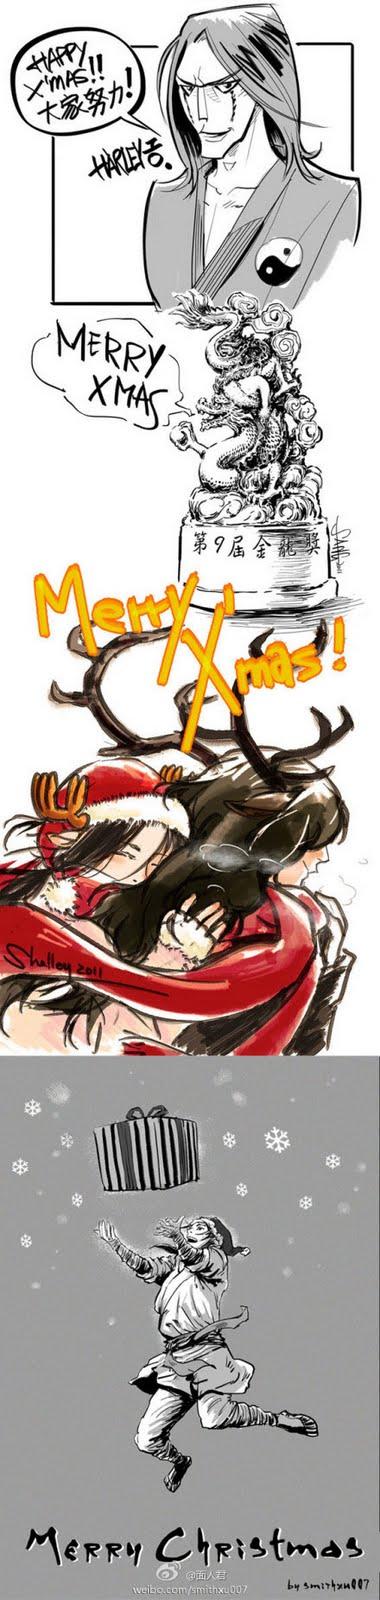 http://1.bp.blogspot.com/-clFruomXV7A/TvVLIGXpN2I/AAAAAAAAK_o/lbpfmZDcueM/s1600/Christmas_2011-02.jpg